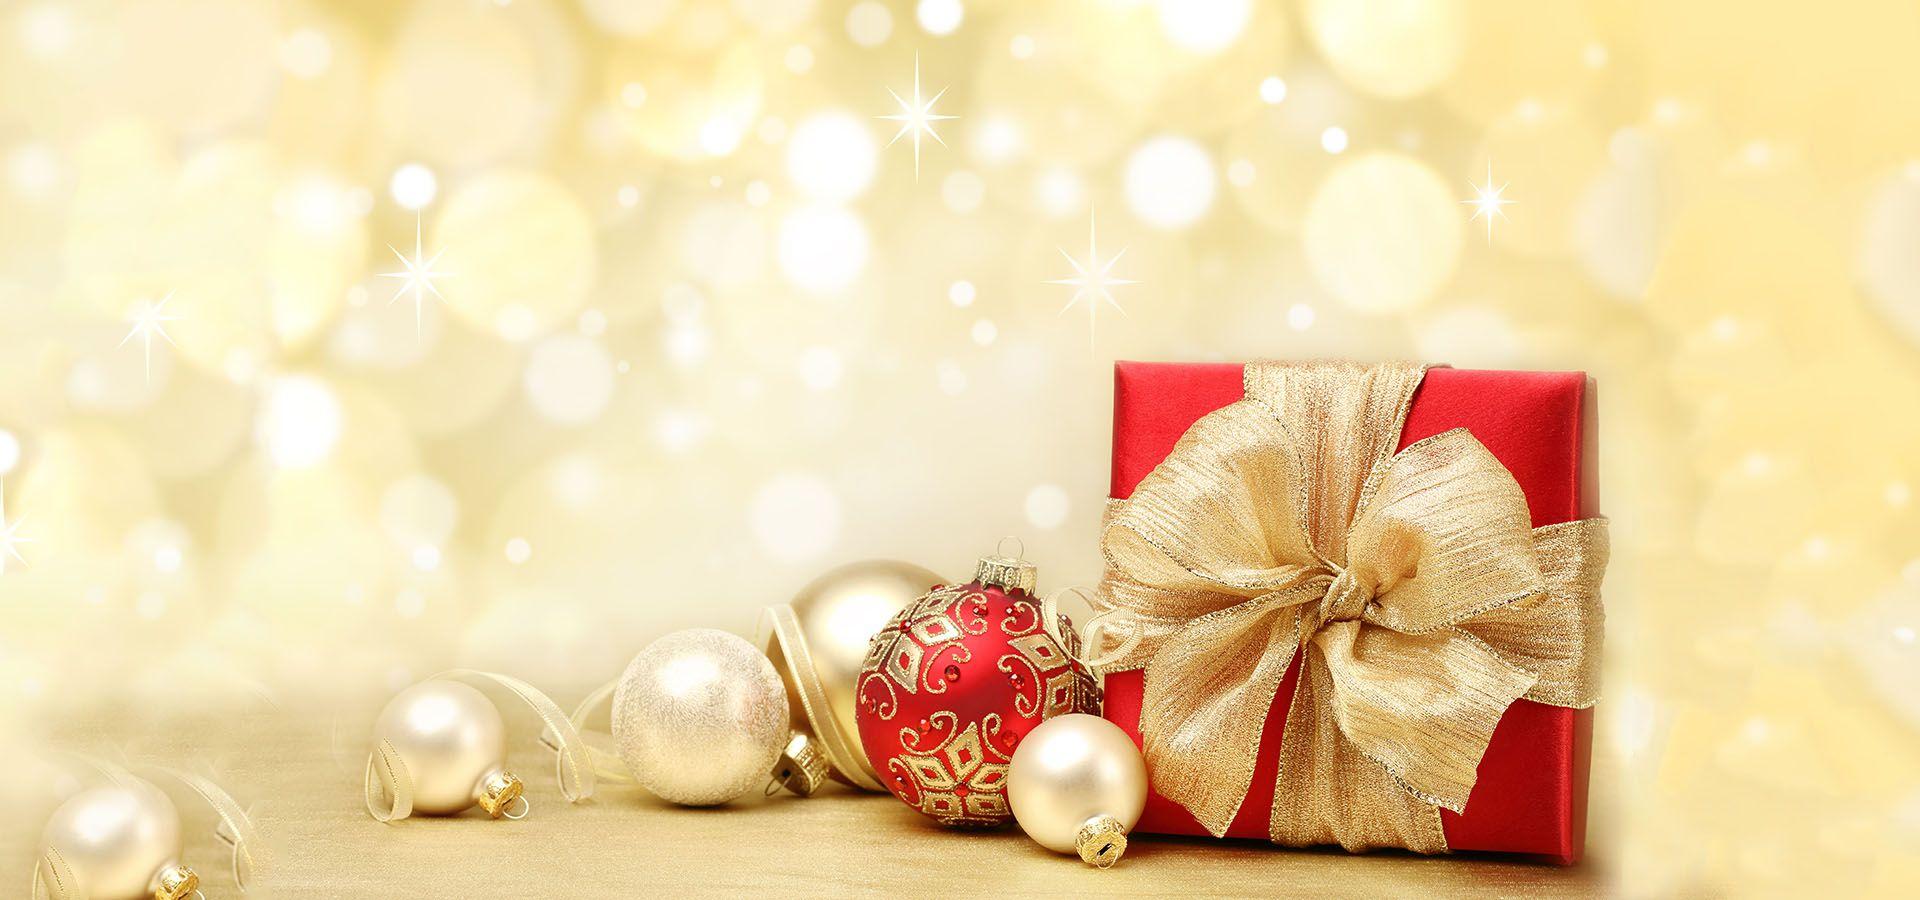 Golden Christmas Gift Background Christmas gift